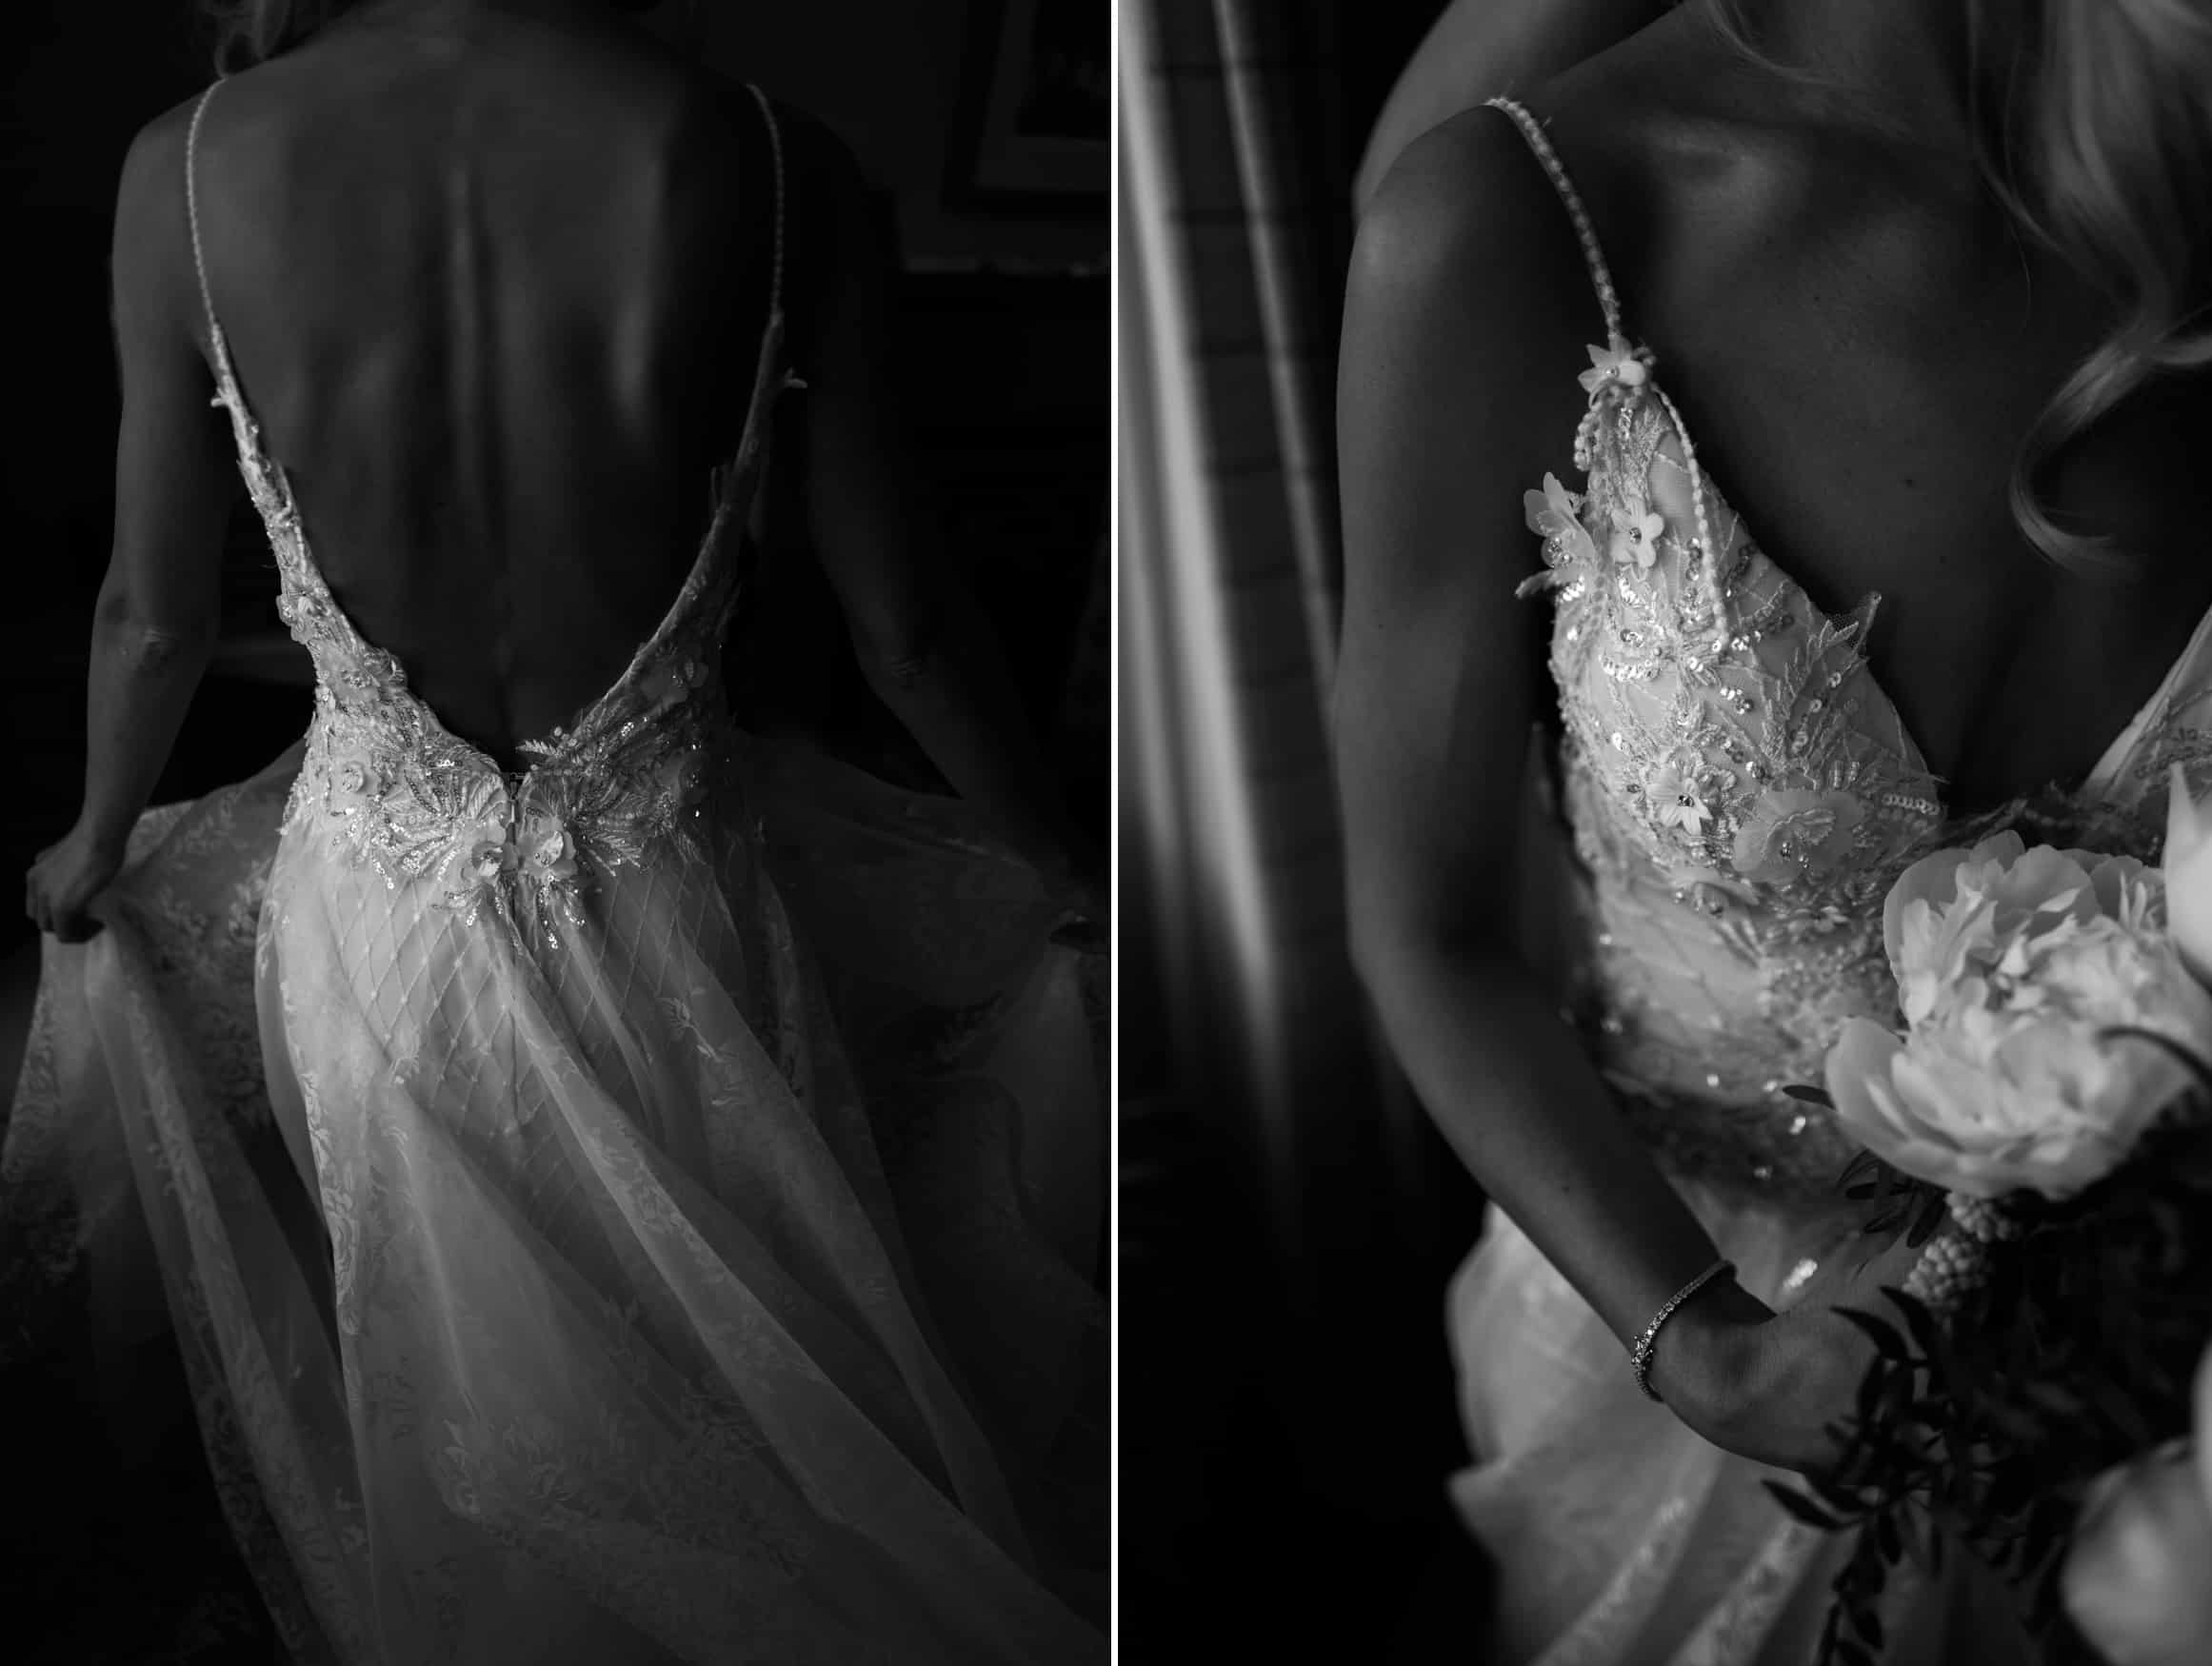 close ups of the dress